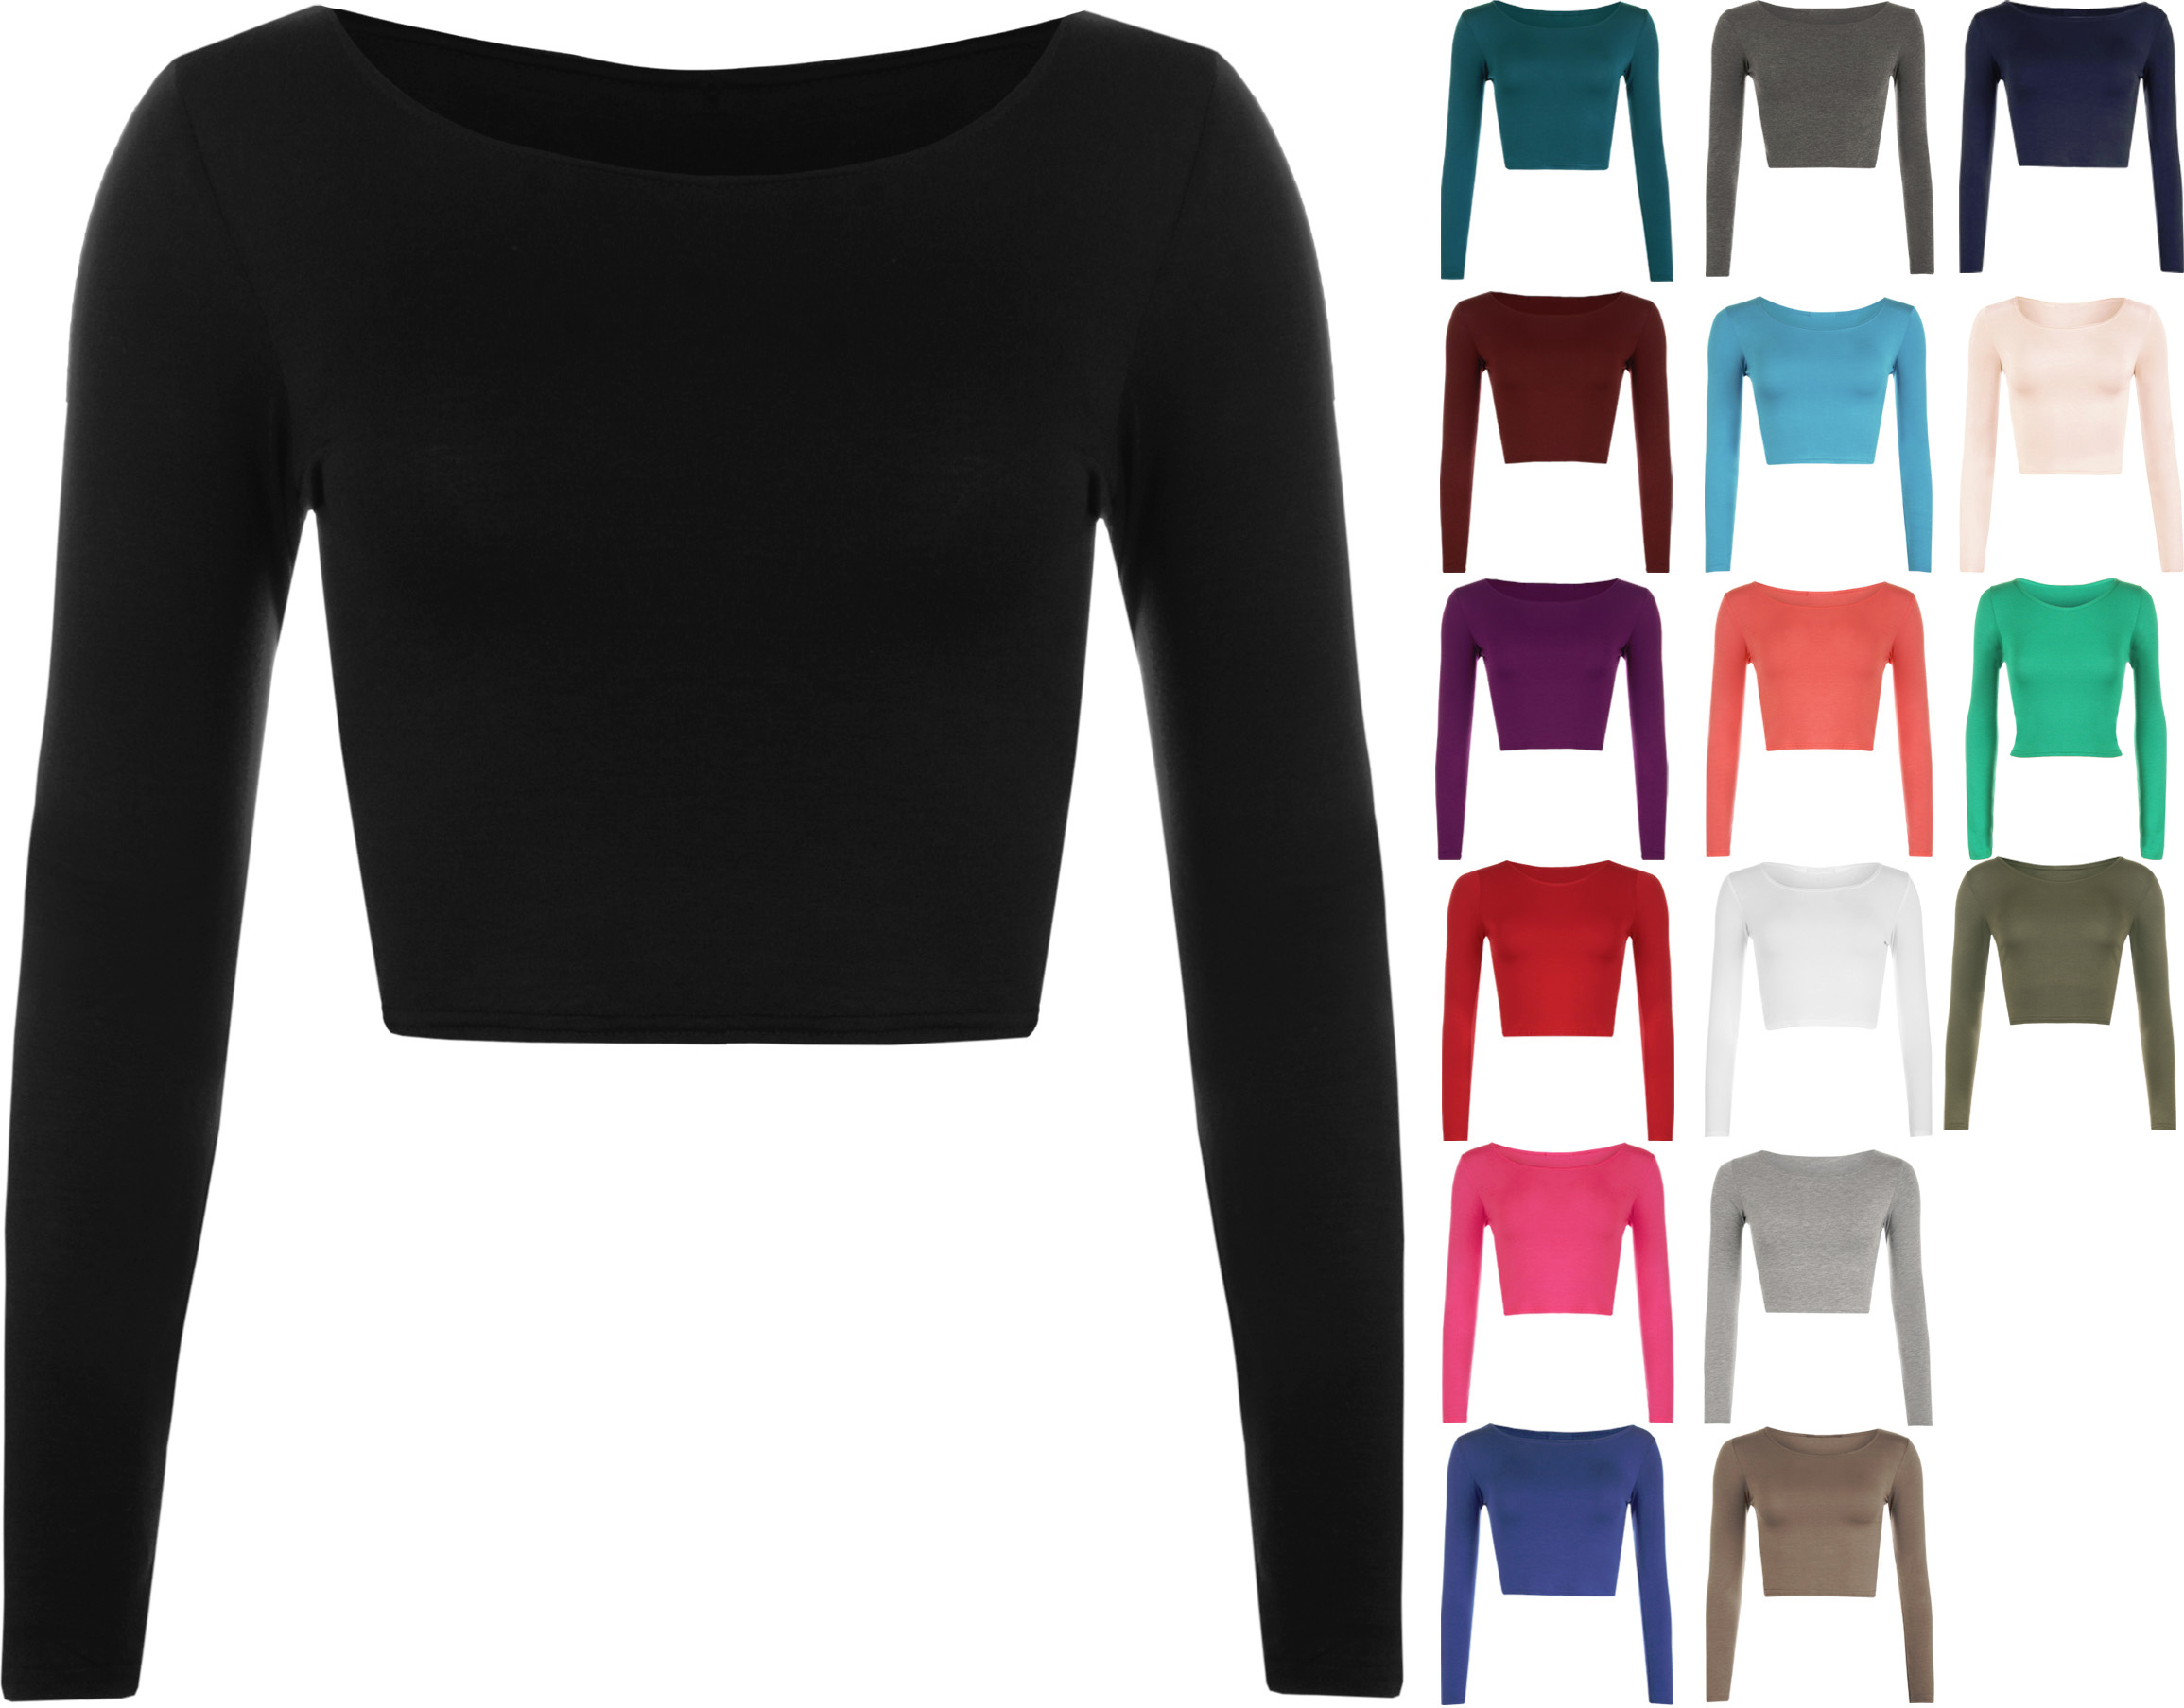 8c4eef51ea7 New Womens Crop Basic Long Sleeve T Shirt Ladies Short Plain Round ...